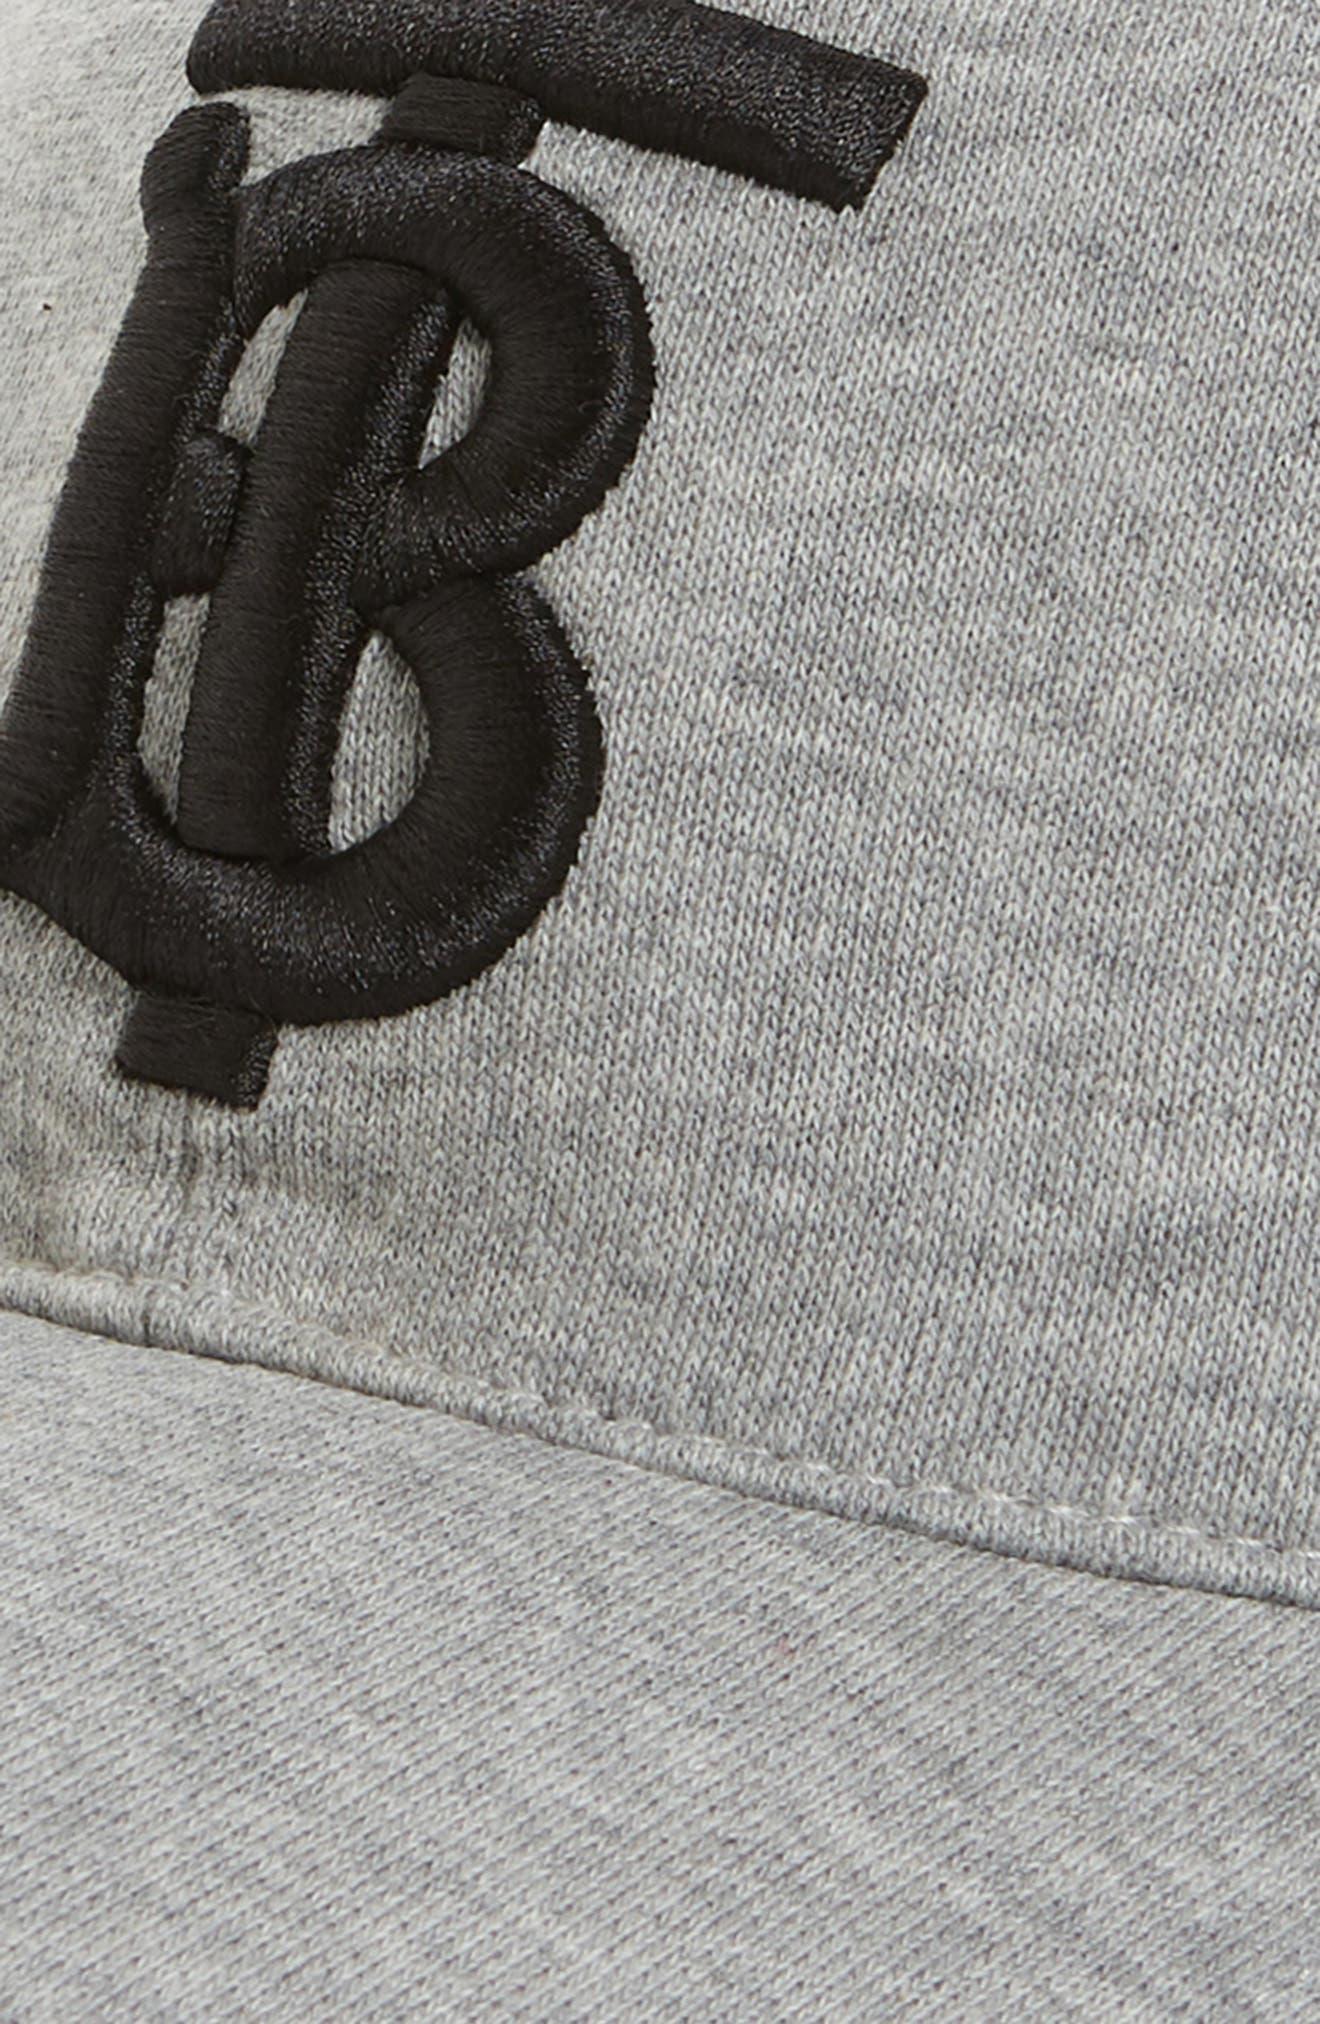 BURBERRY, Jersey Baseball Cap, Alternate thumbnail 3, color, LIGHT GREY MELANGE